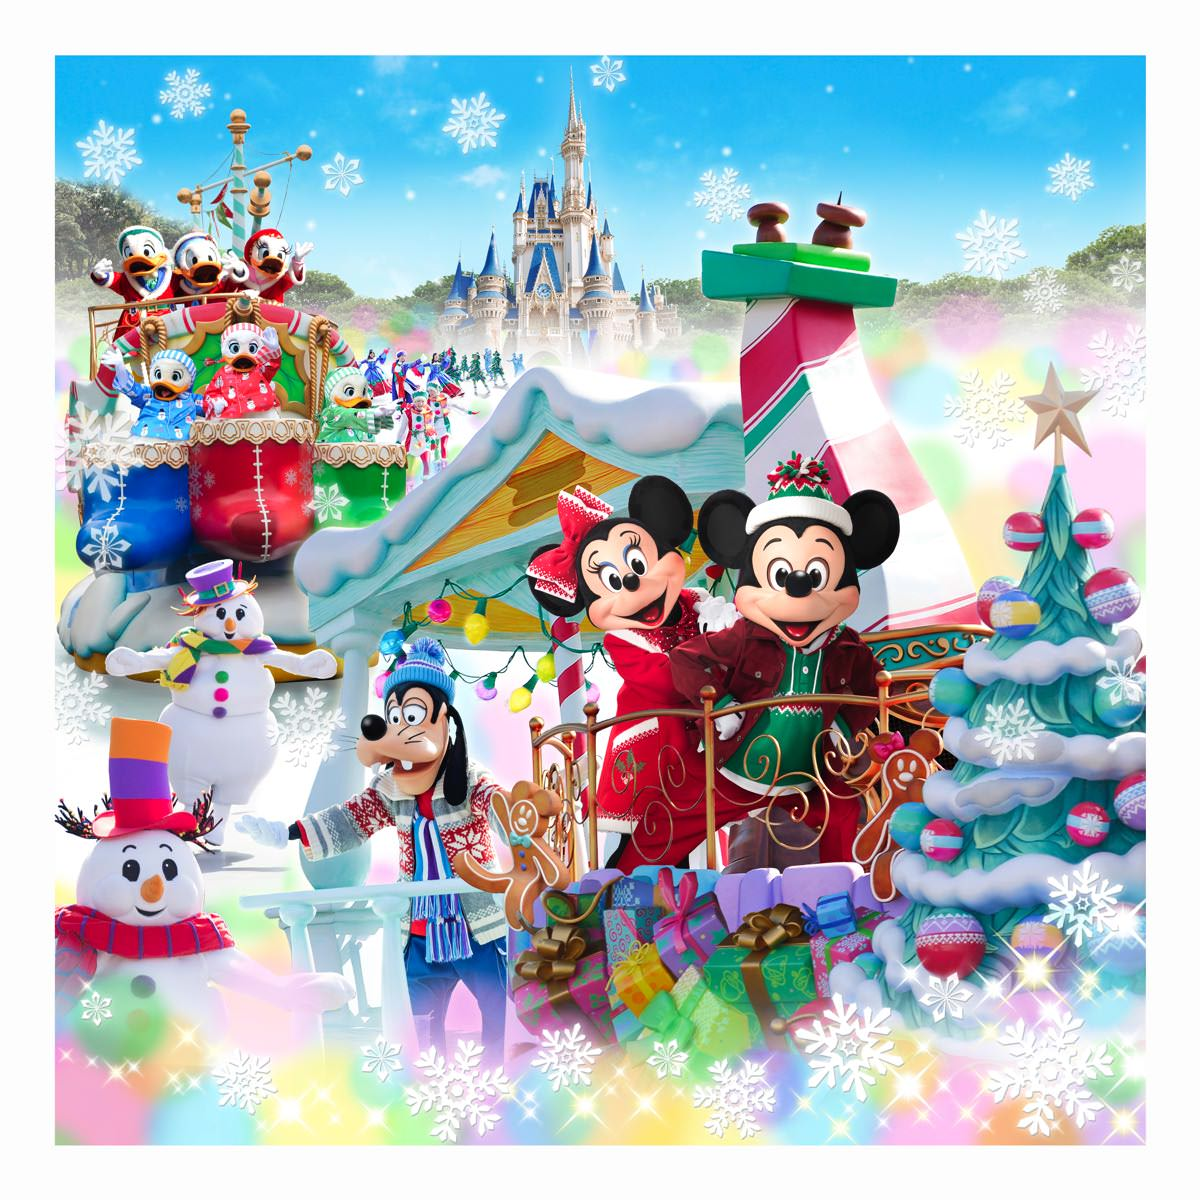 jalが協賛!東京ディズニーランド®のクリスマスパレード「ディズニー